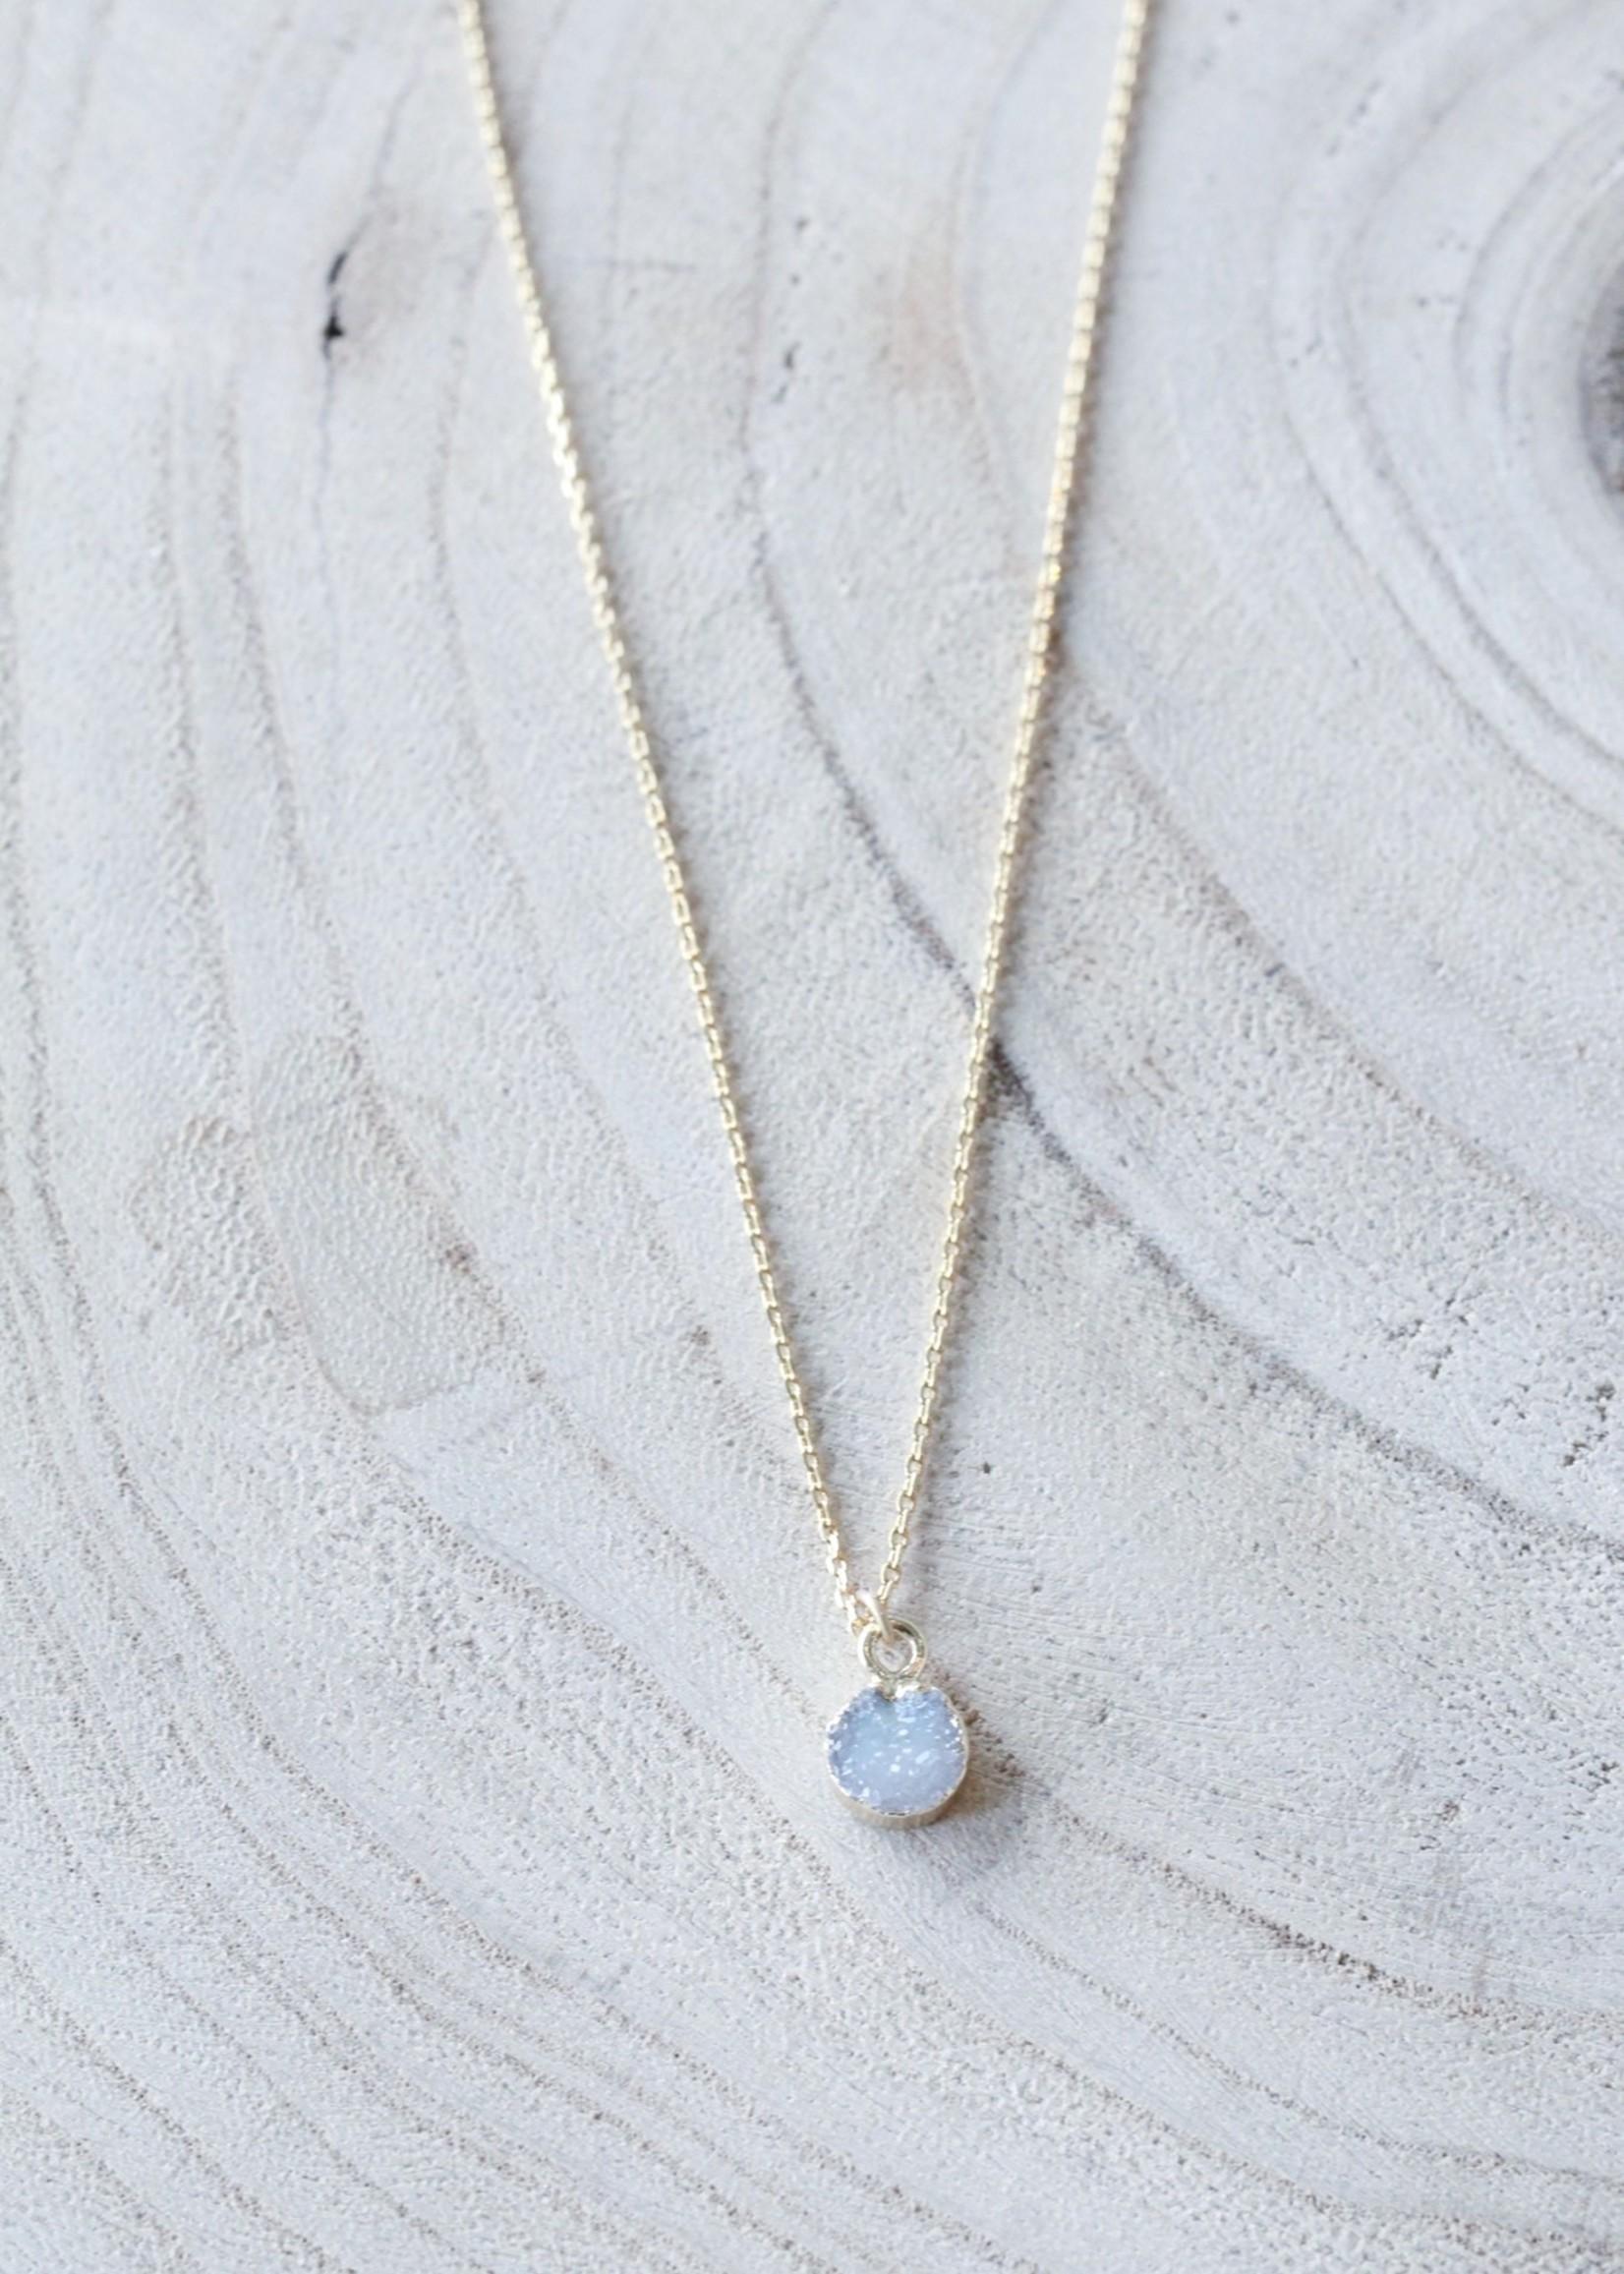 Allison Conway AC Dainty Grey Geode Necklace